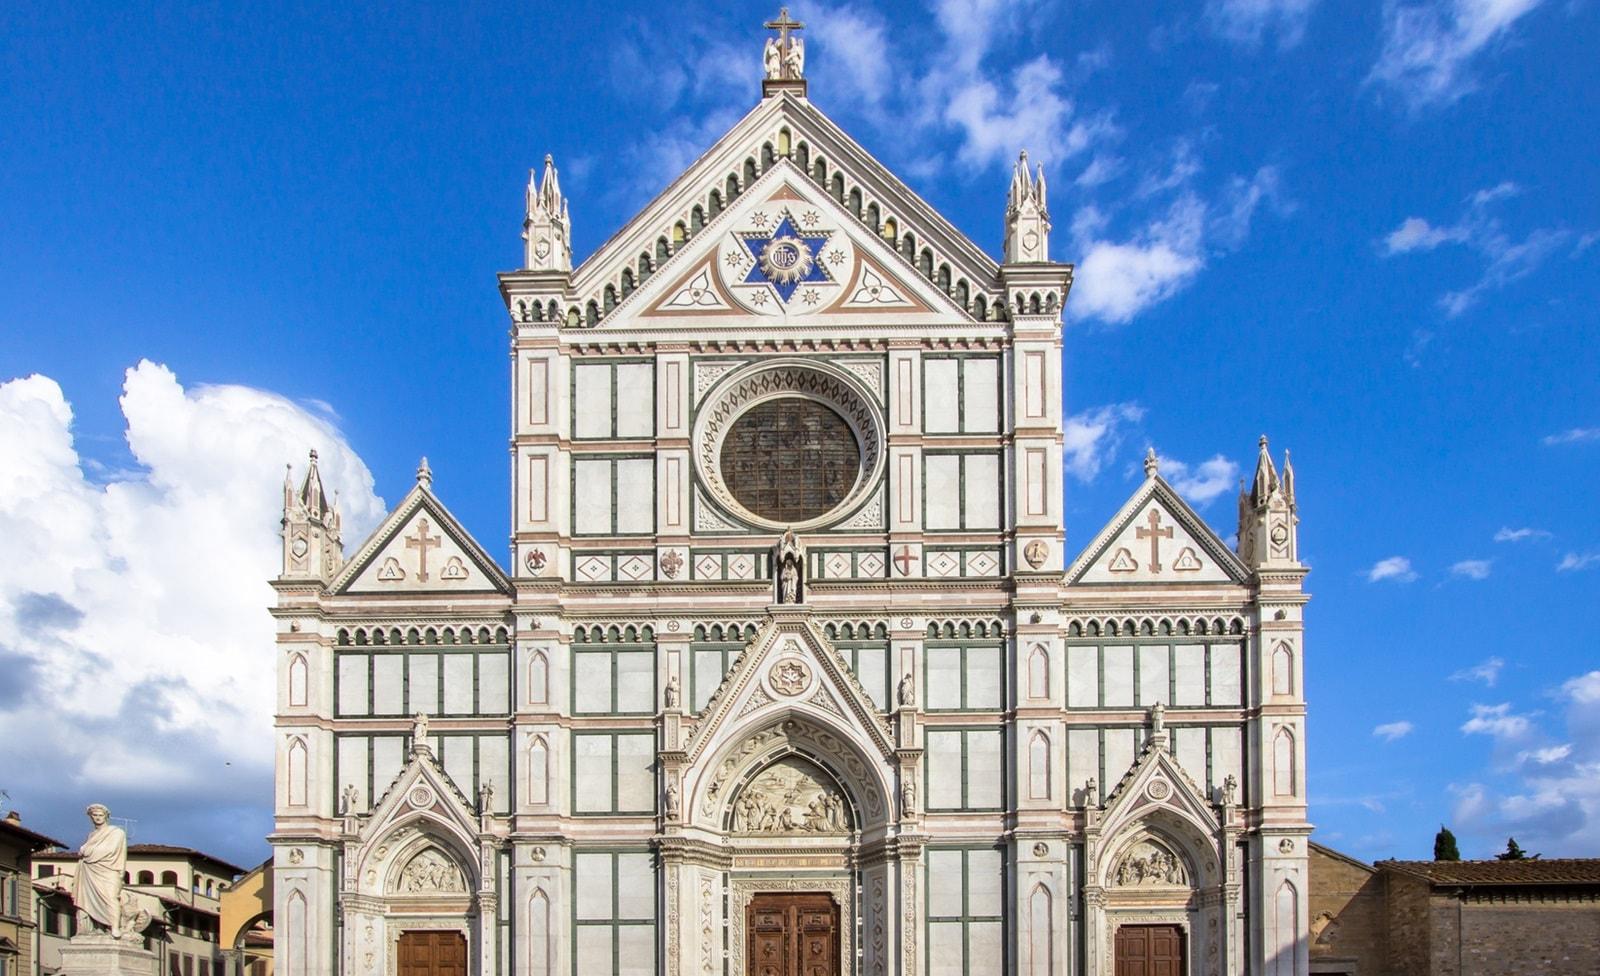 Basilica Santa Croce